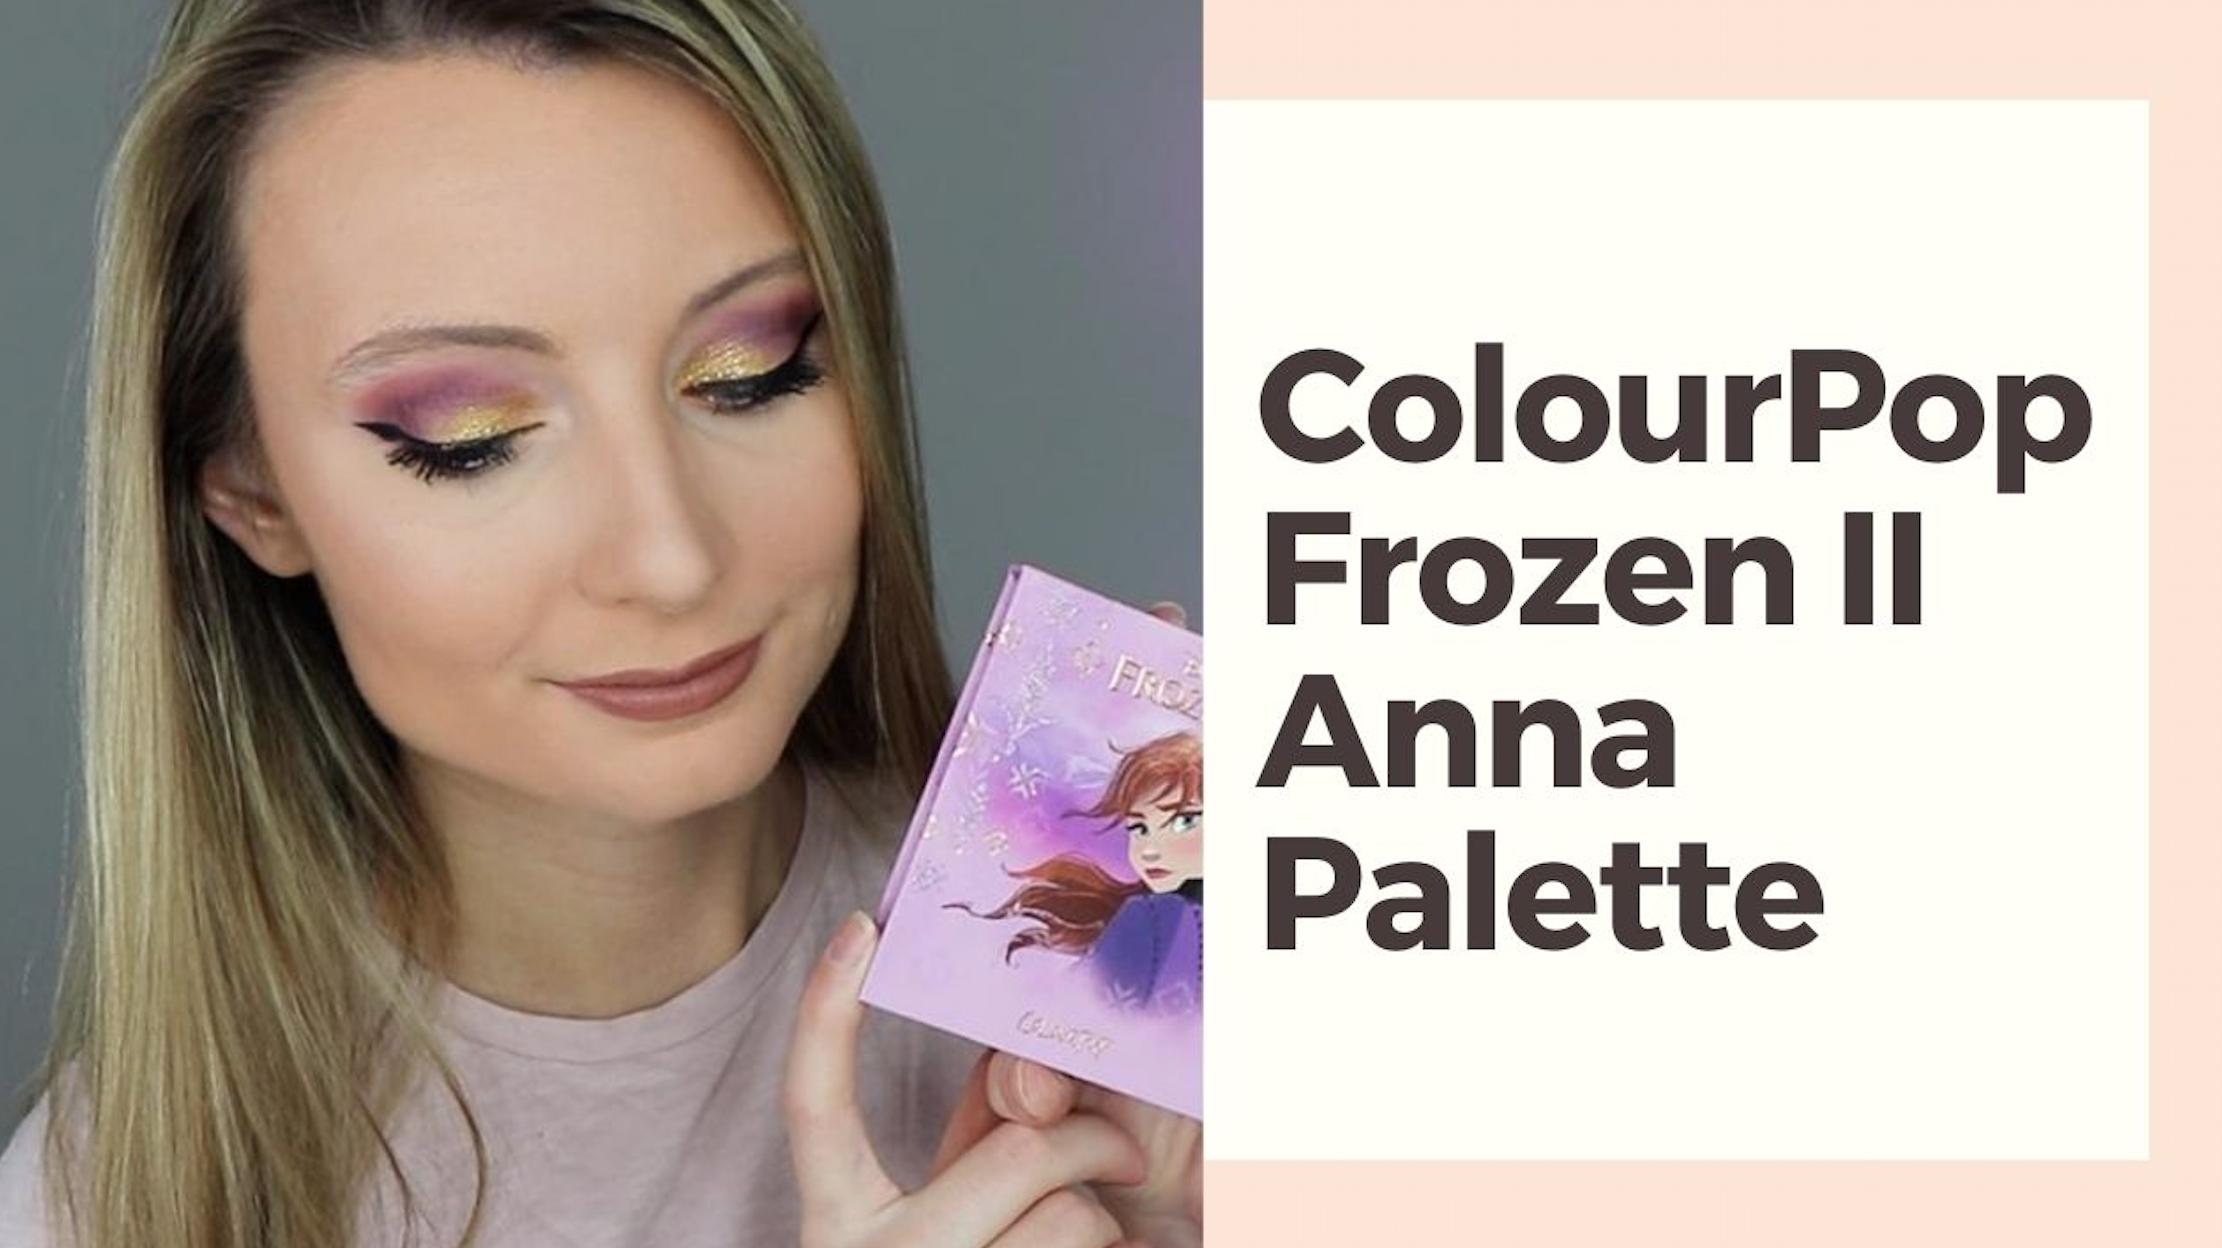 Colourpop Frozen II Anna Palette Review & Tutorial